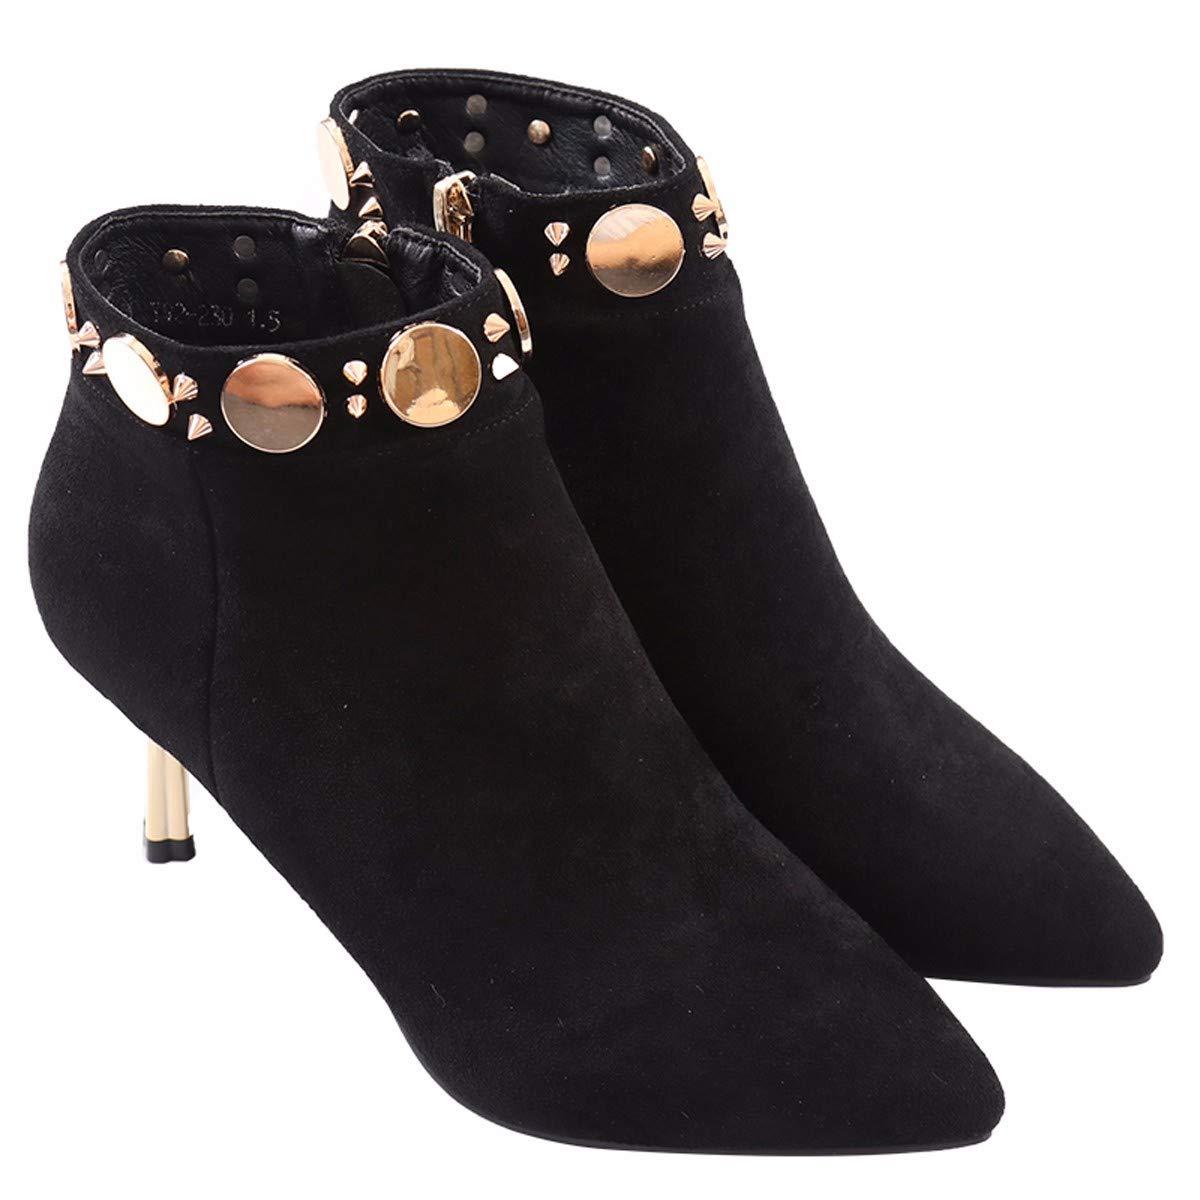 LBTSQ-Mode/Damenschuhe/Kurze Stiefel Mit Hohen 6 cm Winter Spitze Gut Bei Fuß Aus Samt Nieten Reißverschlüsse Ma Dingxue